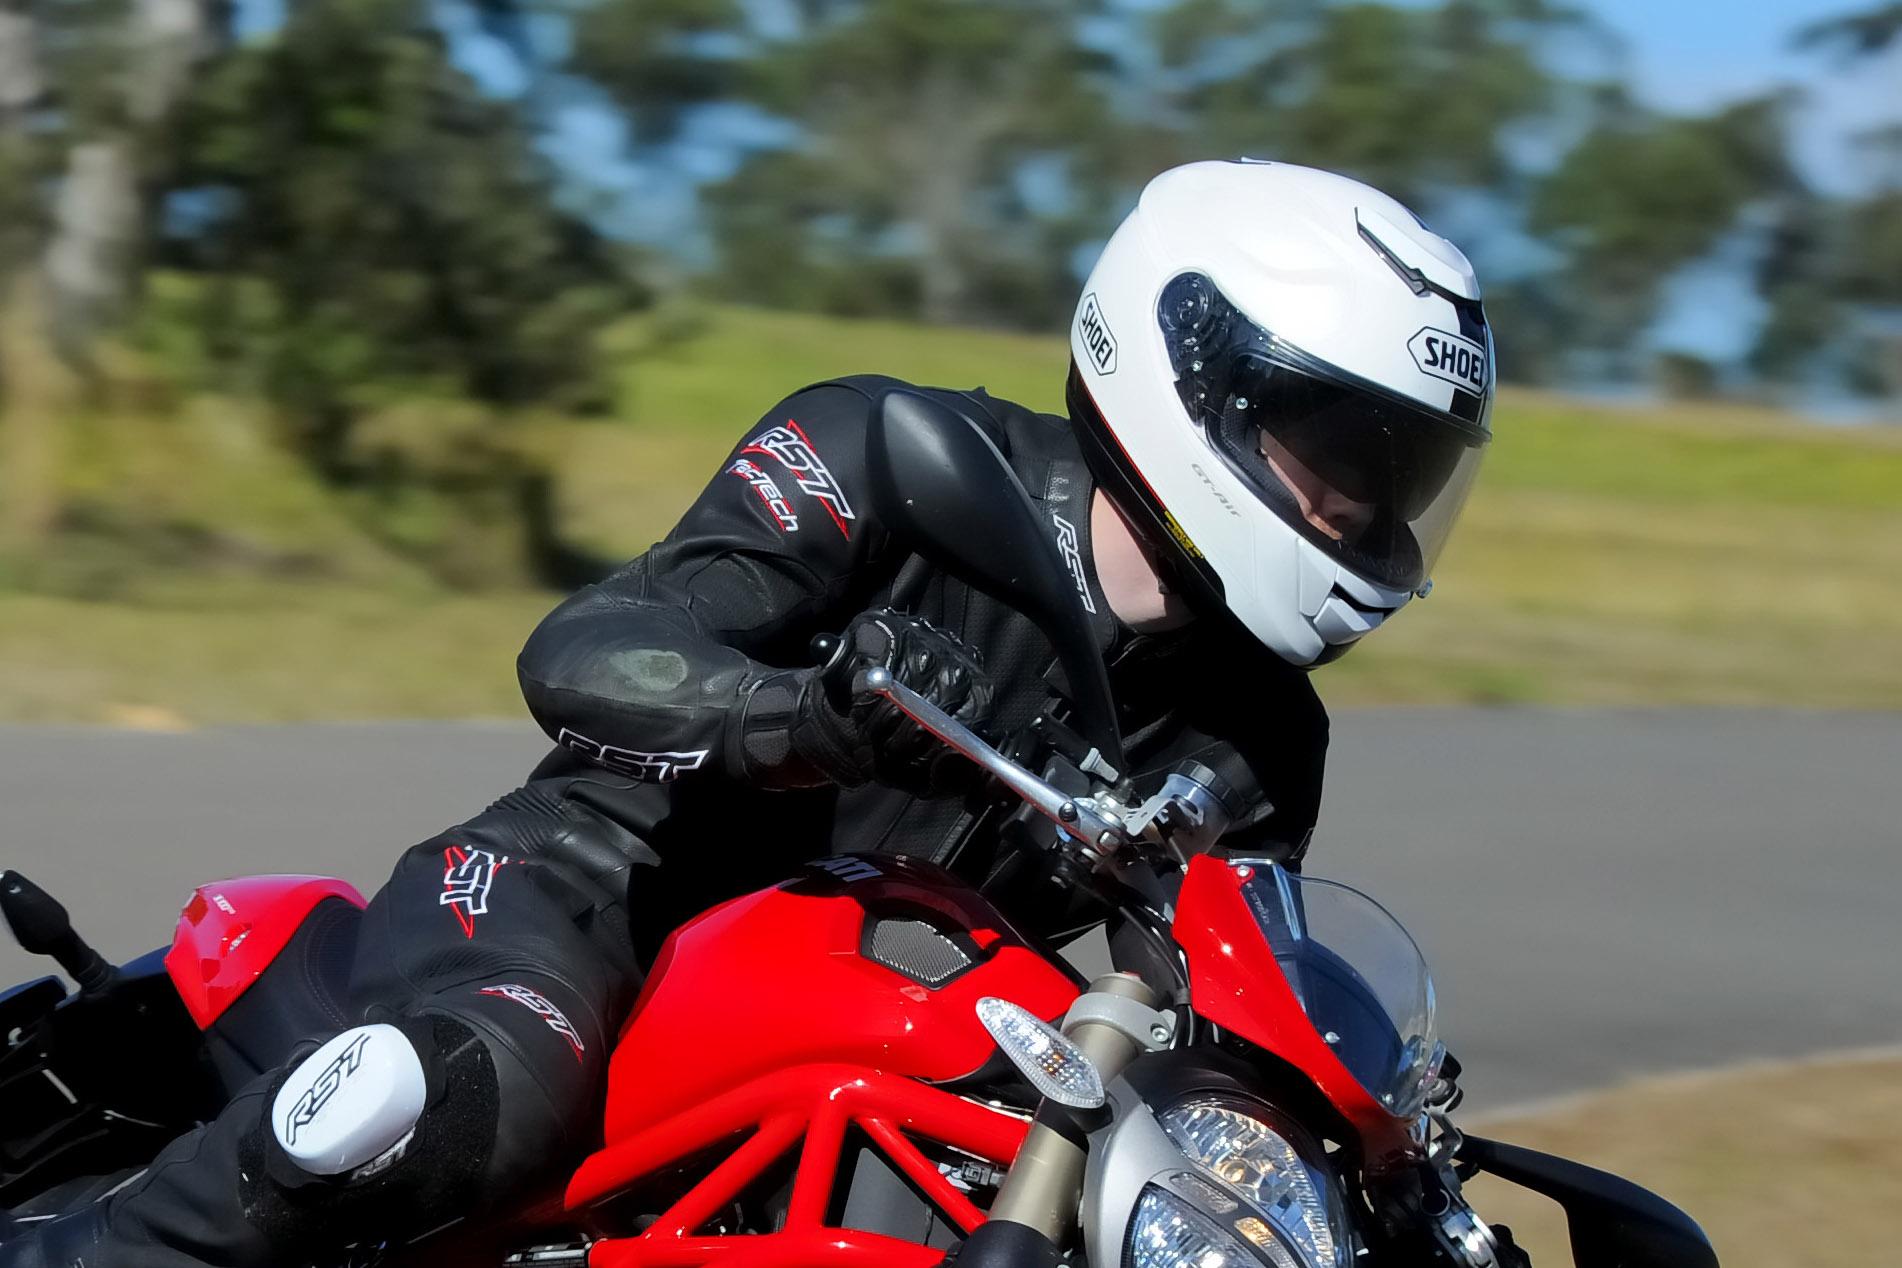 new product shoei gt air helmet bike review. Black Bedroom Furniture Sets. Home Design Ideas